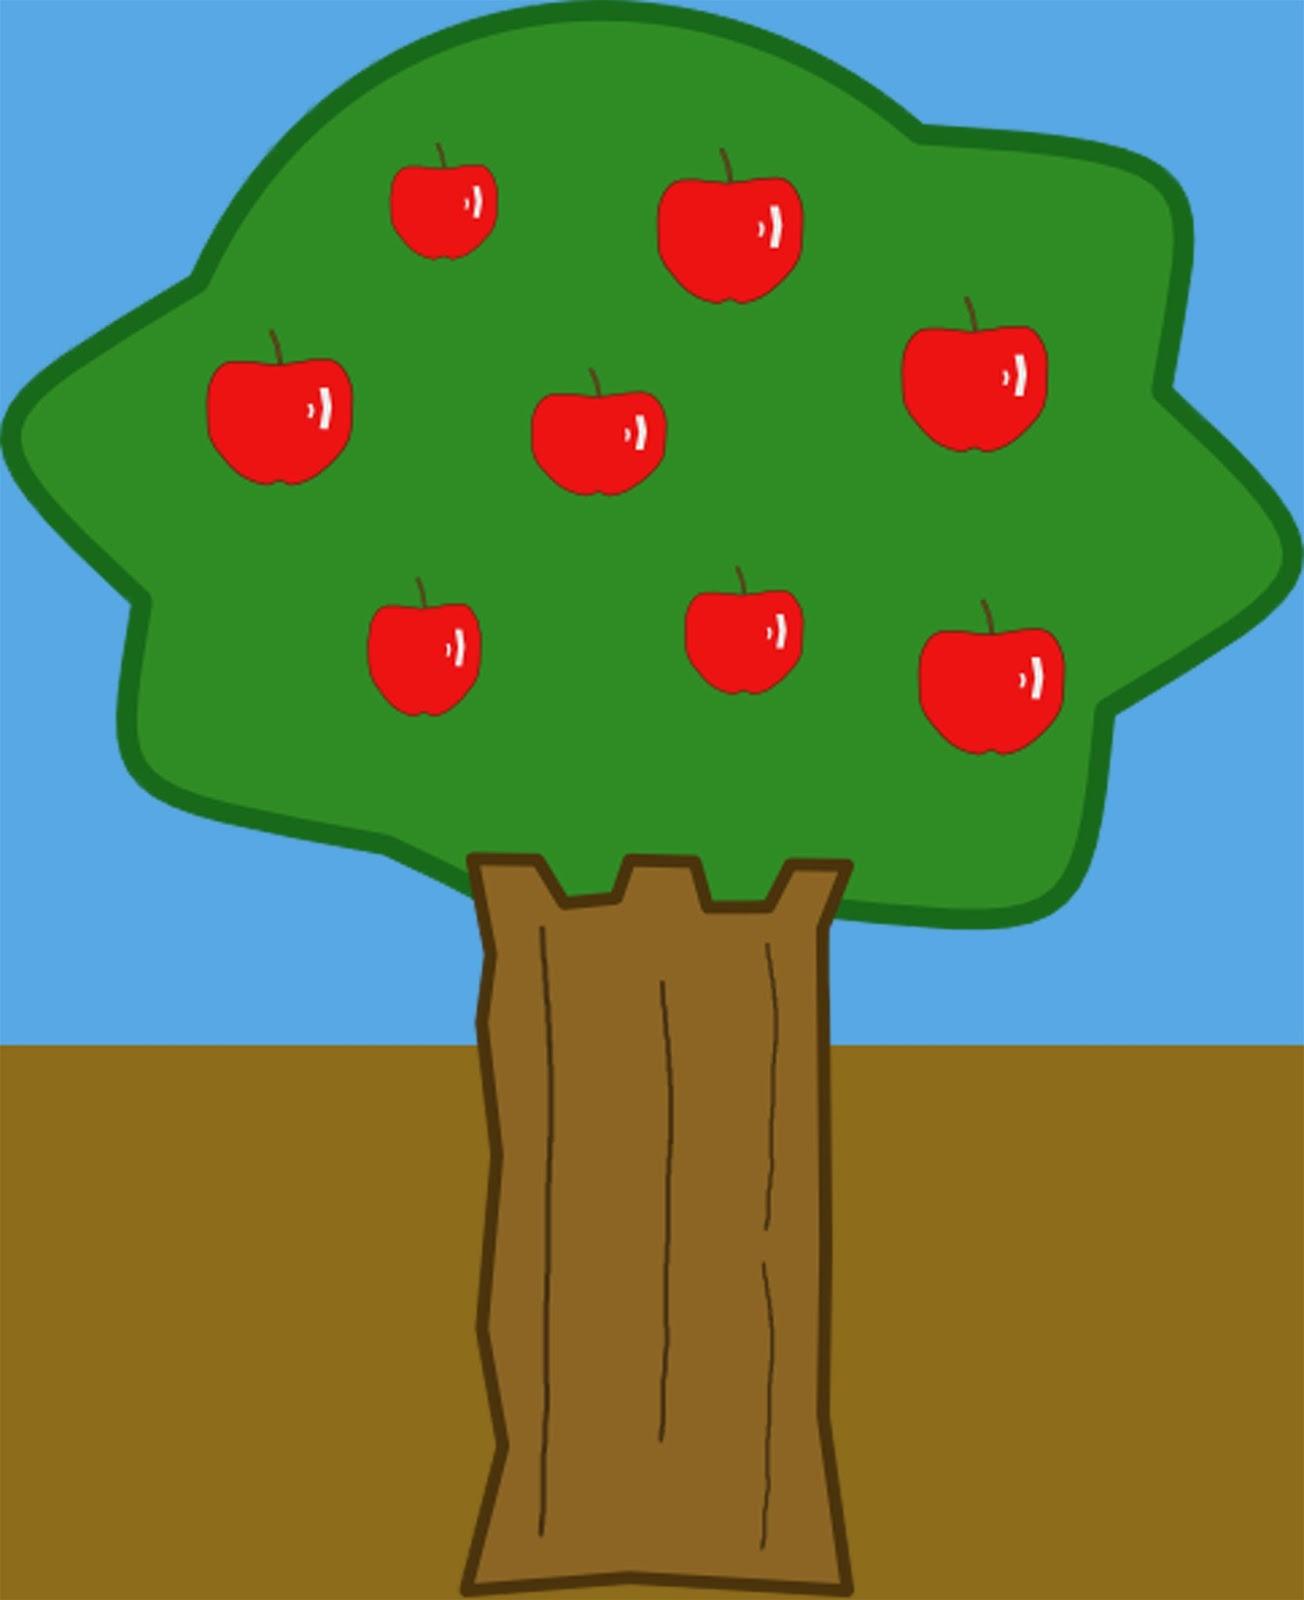 Baum clipart #15, Download drawings